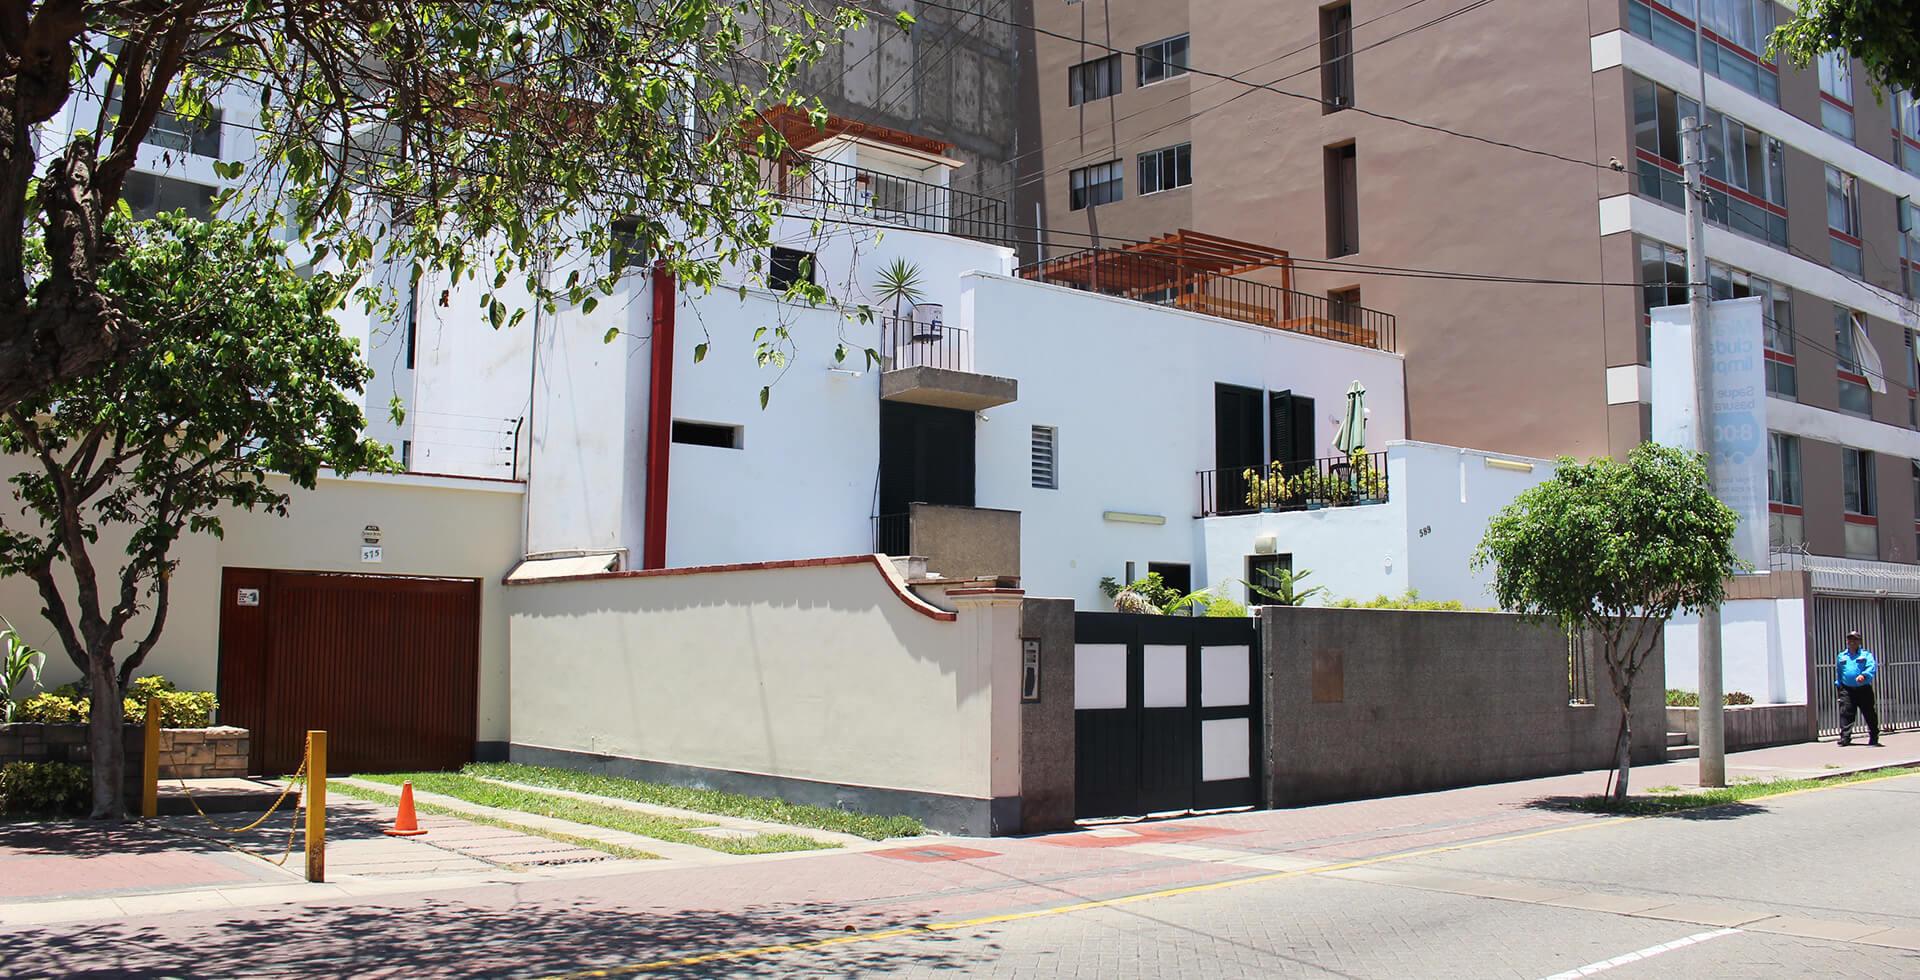 Hostales-hostal-hostel-hostels-miraflores-lima-peru